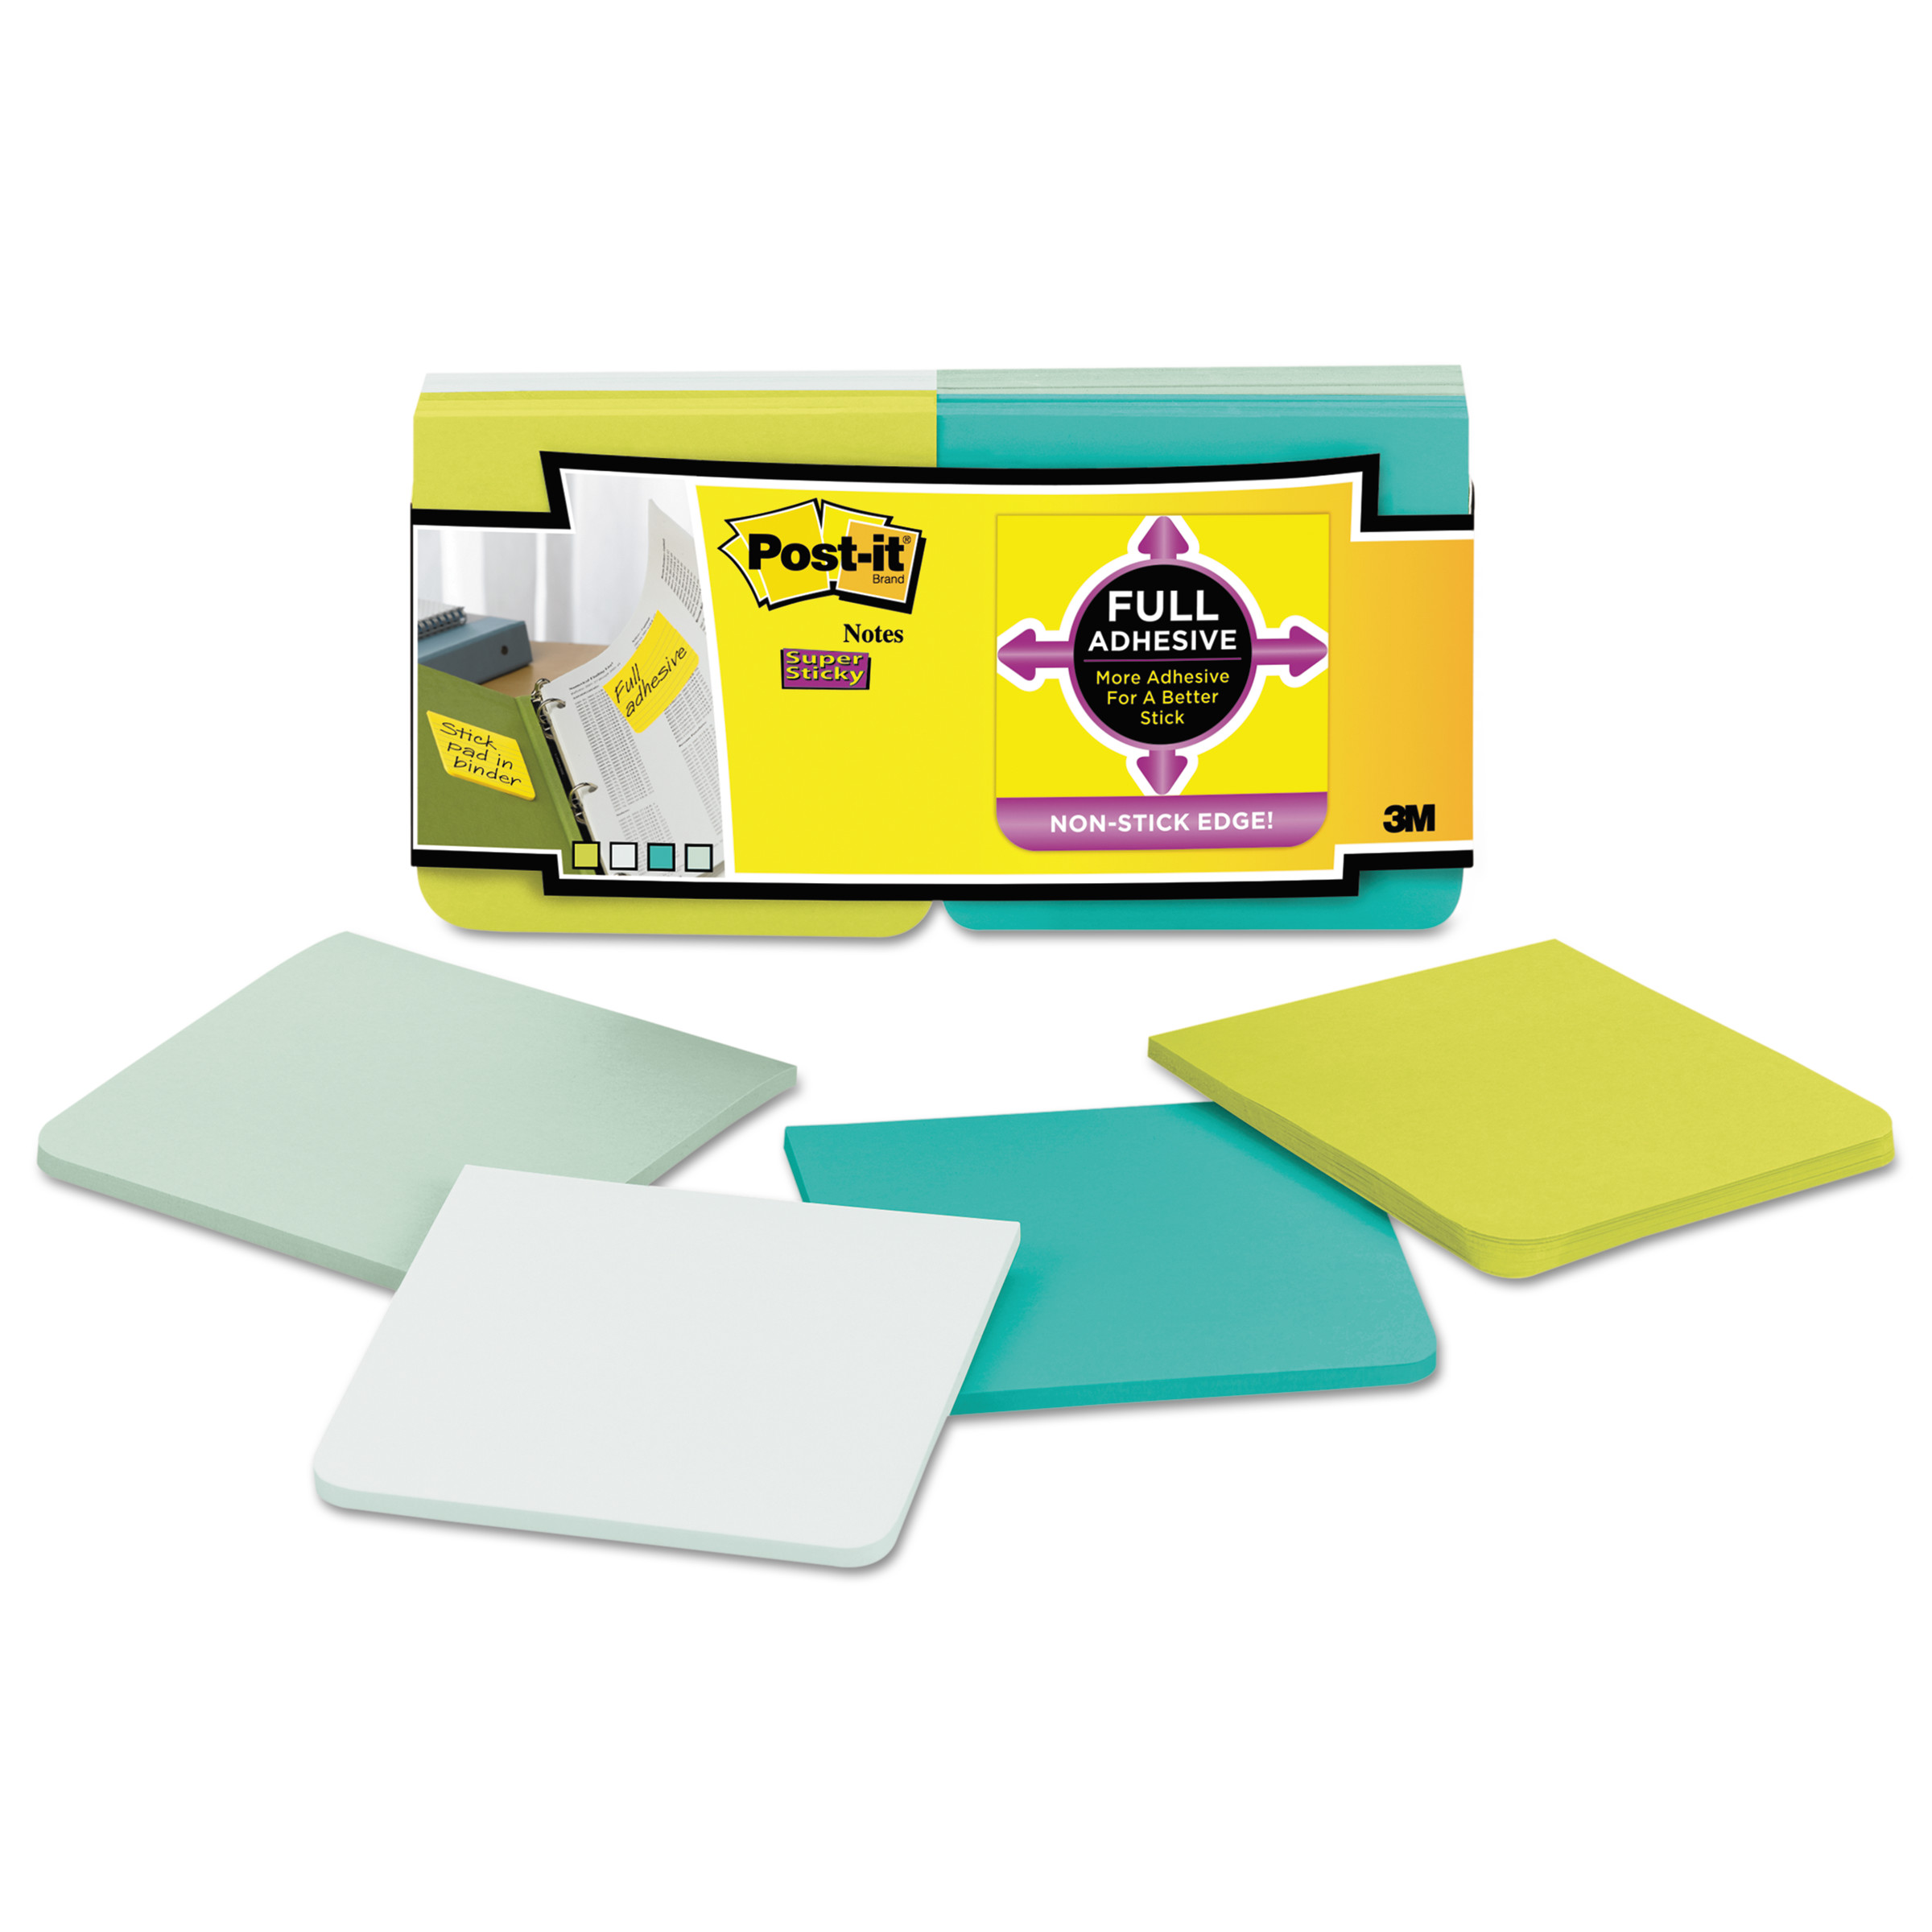 Post-it Notes Super Sticky Full Adhesive Notes, 3 x 3, Bora Bora Colors, 12/Pack -MMMF33012SSFM